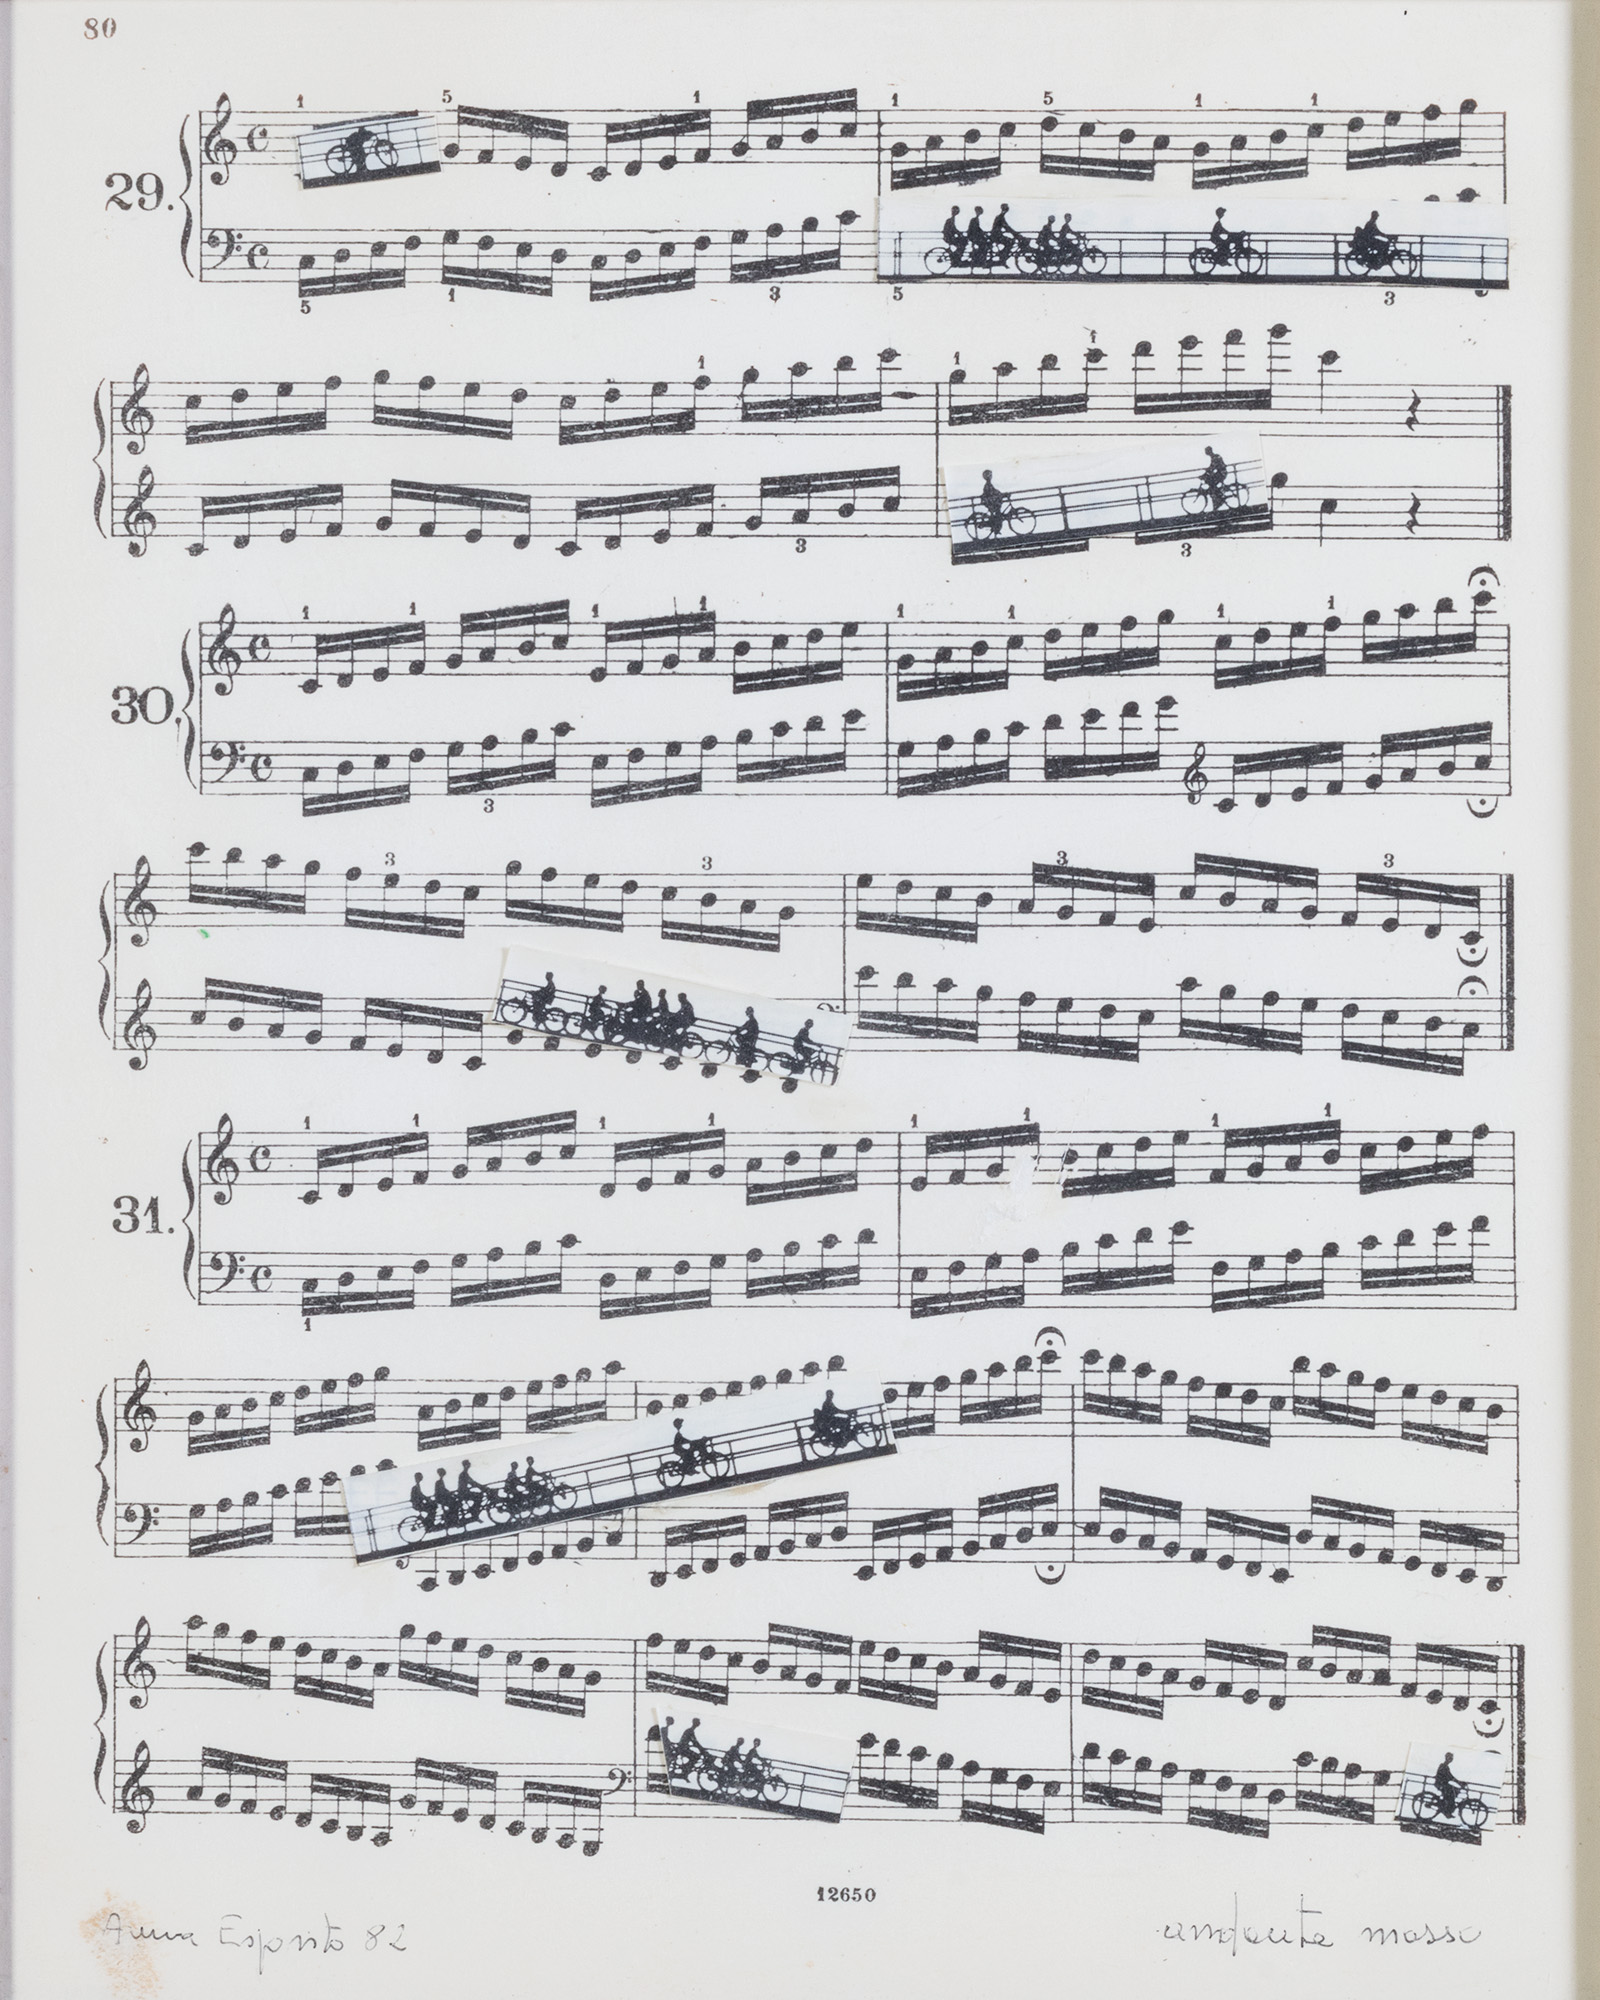 Andante mosso, 1982